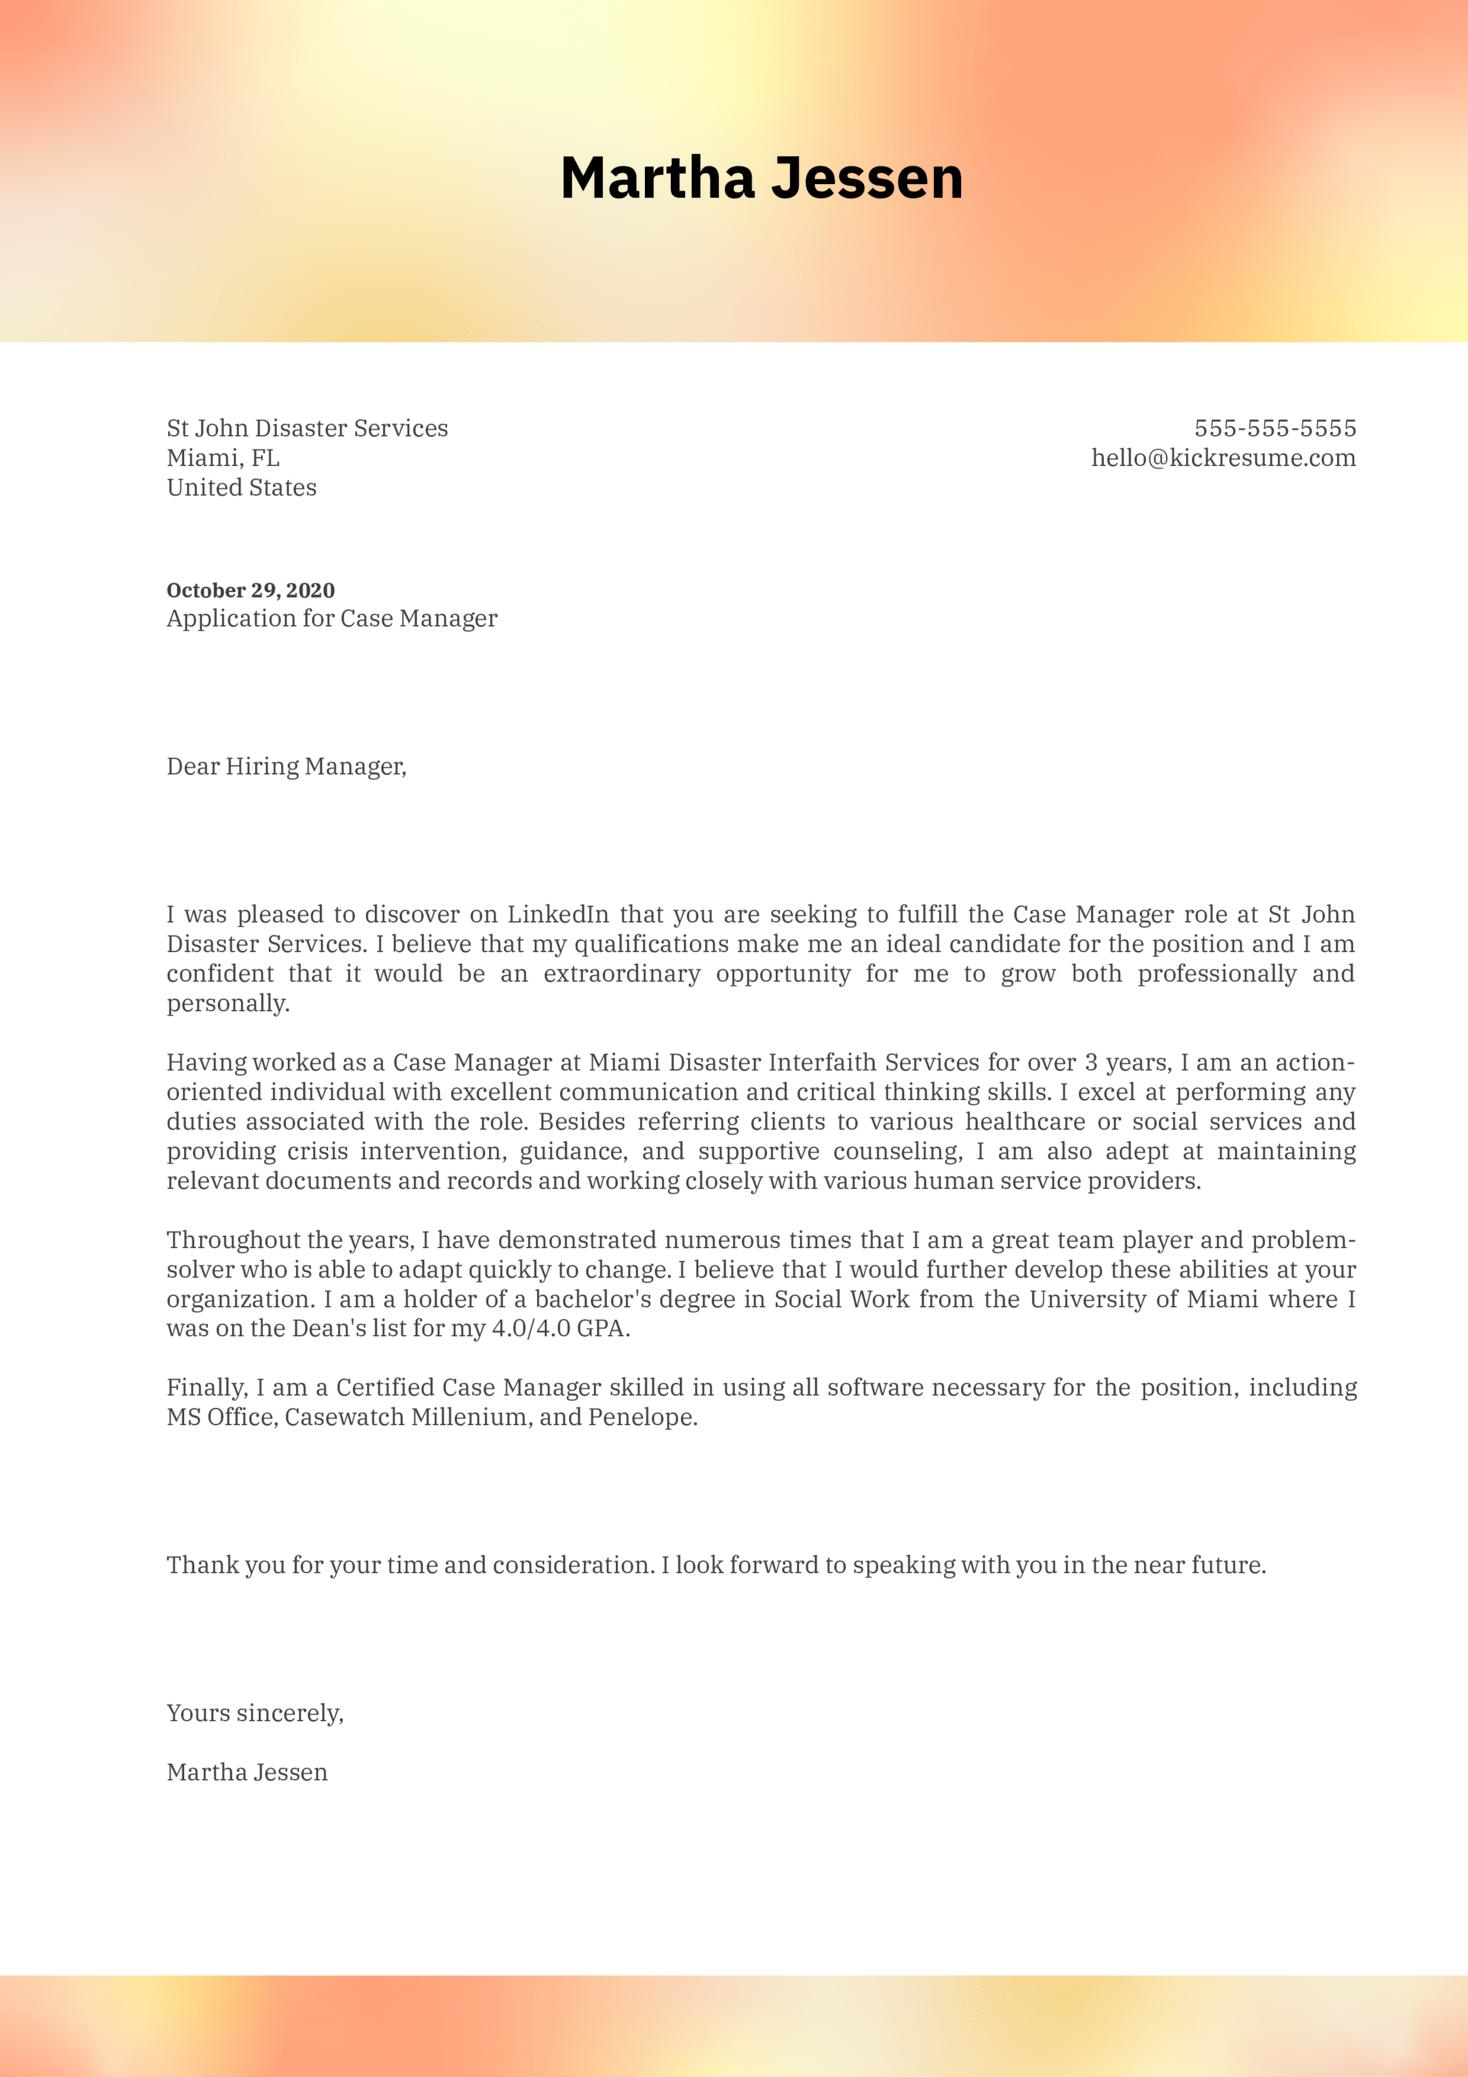 Case Manager Cover Letter Sample